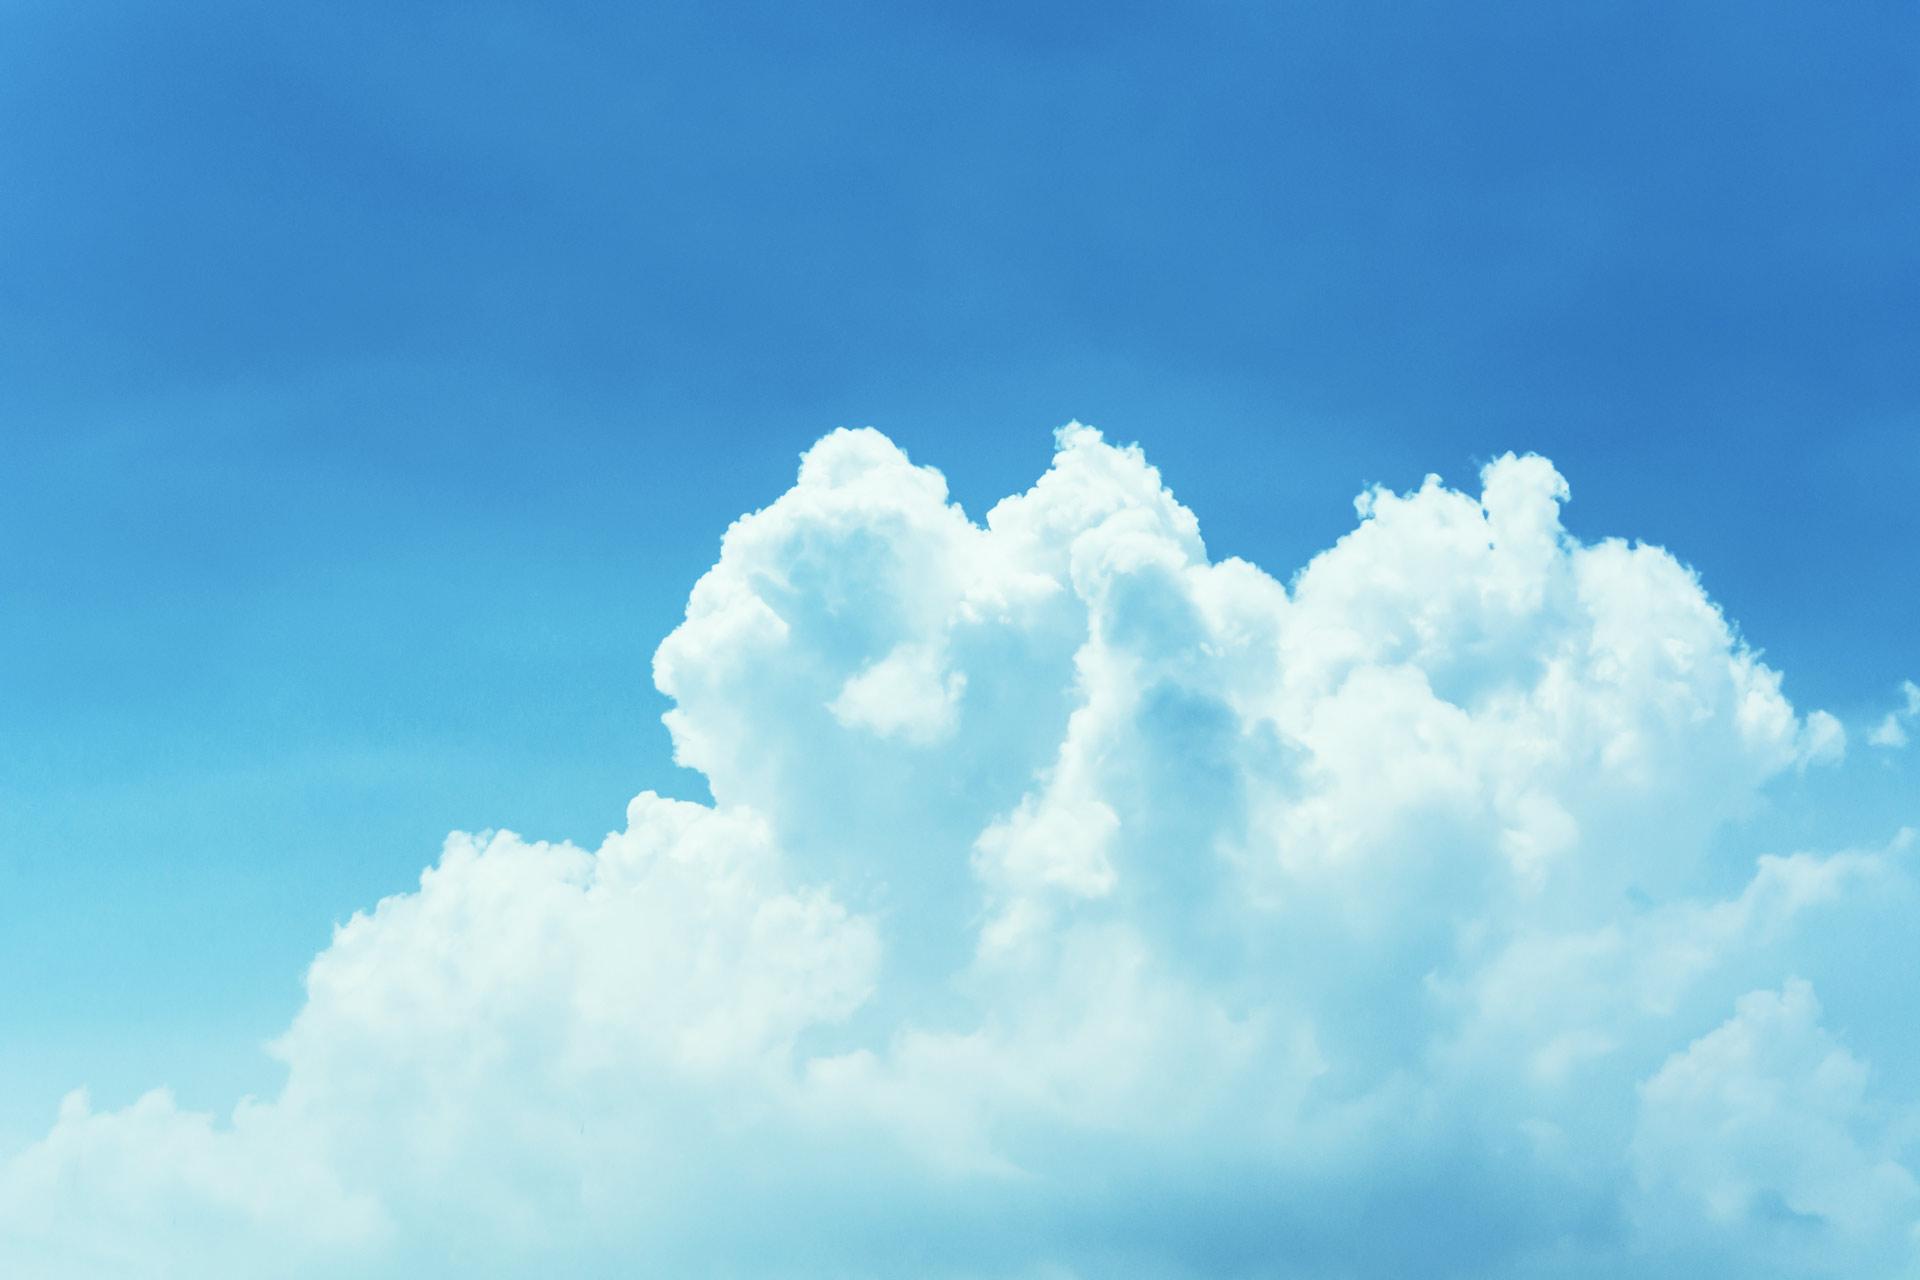 Datatrim-header-sky1-1920-1280